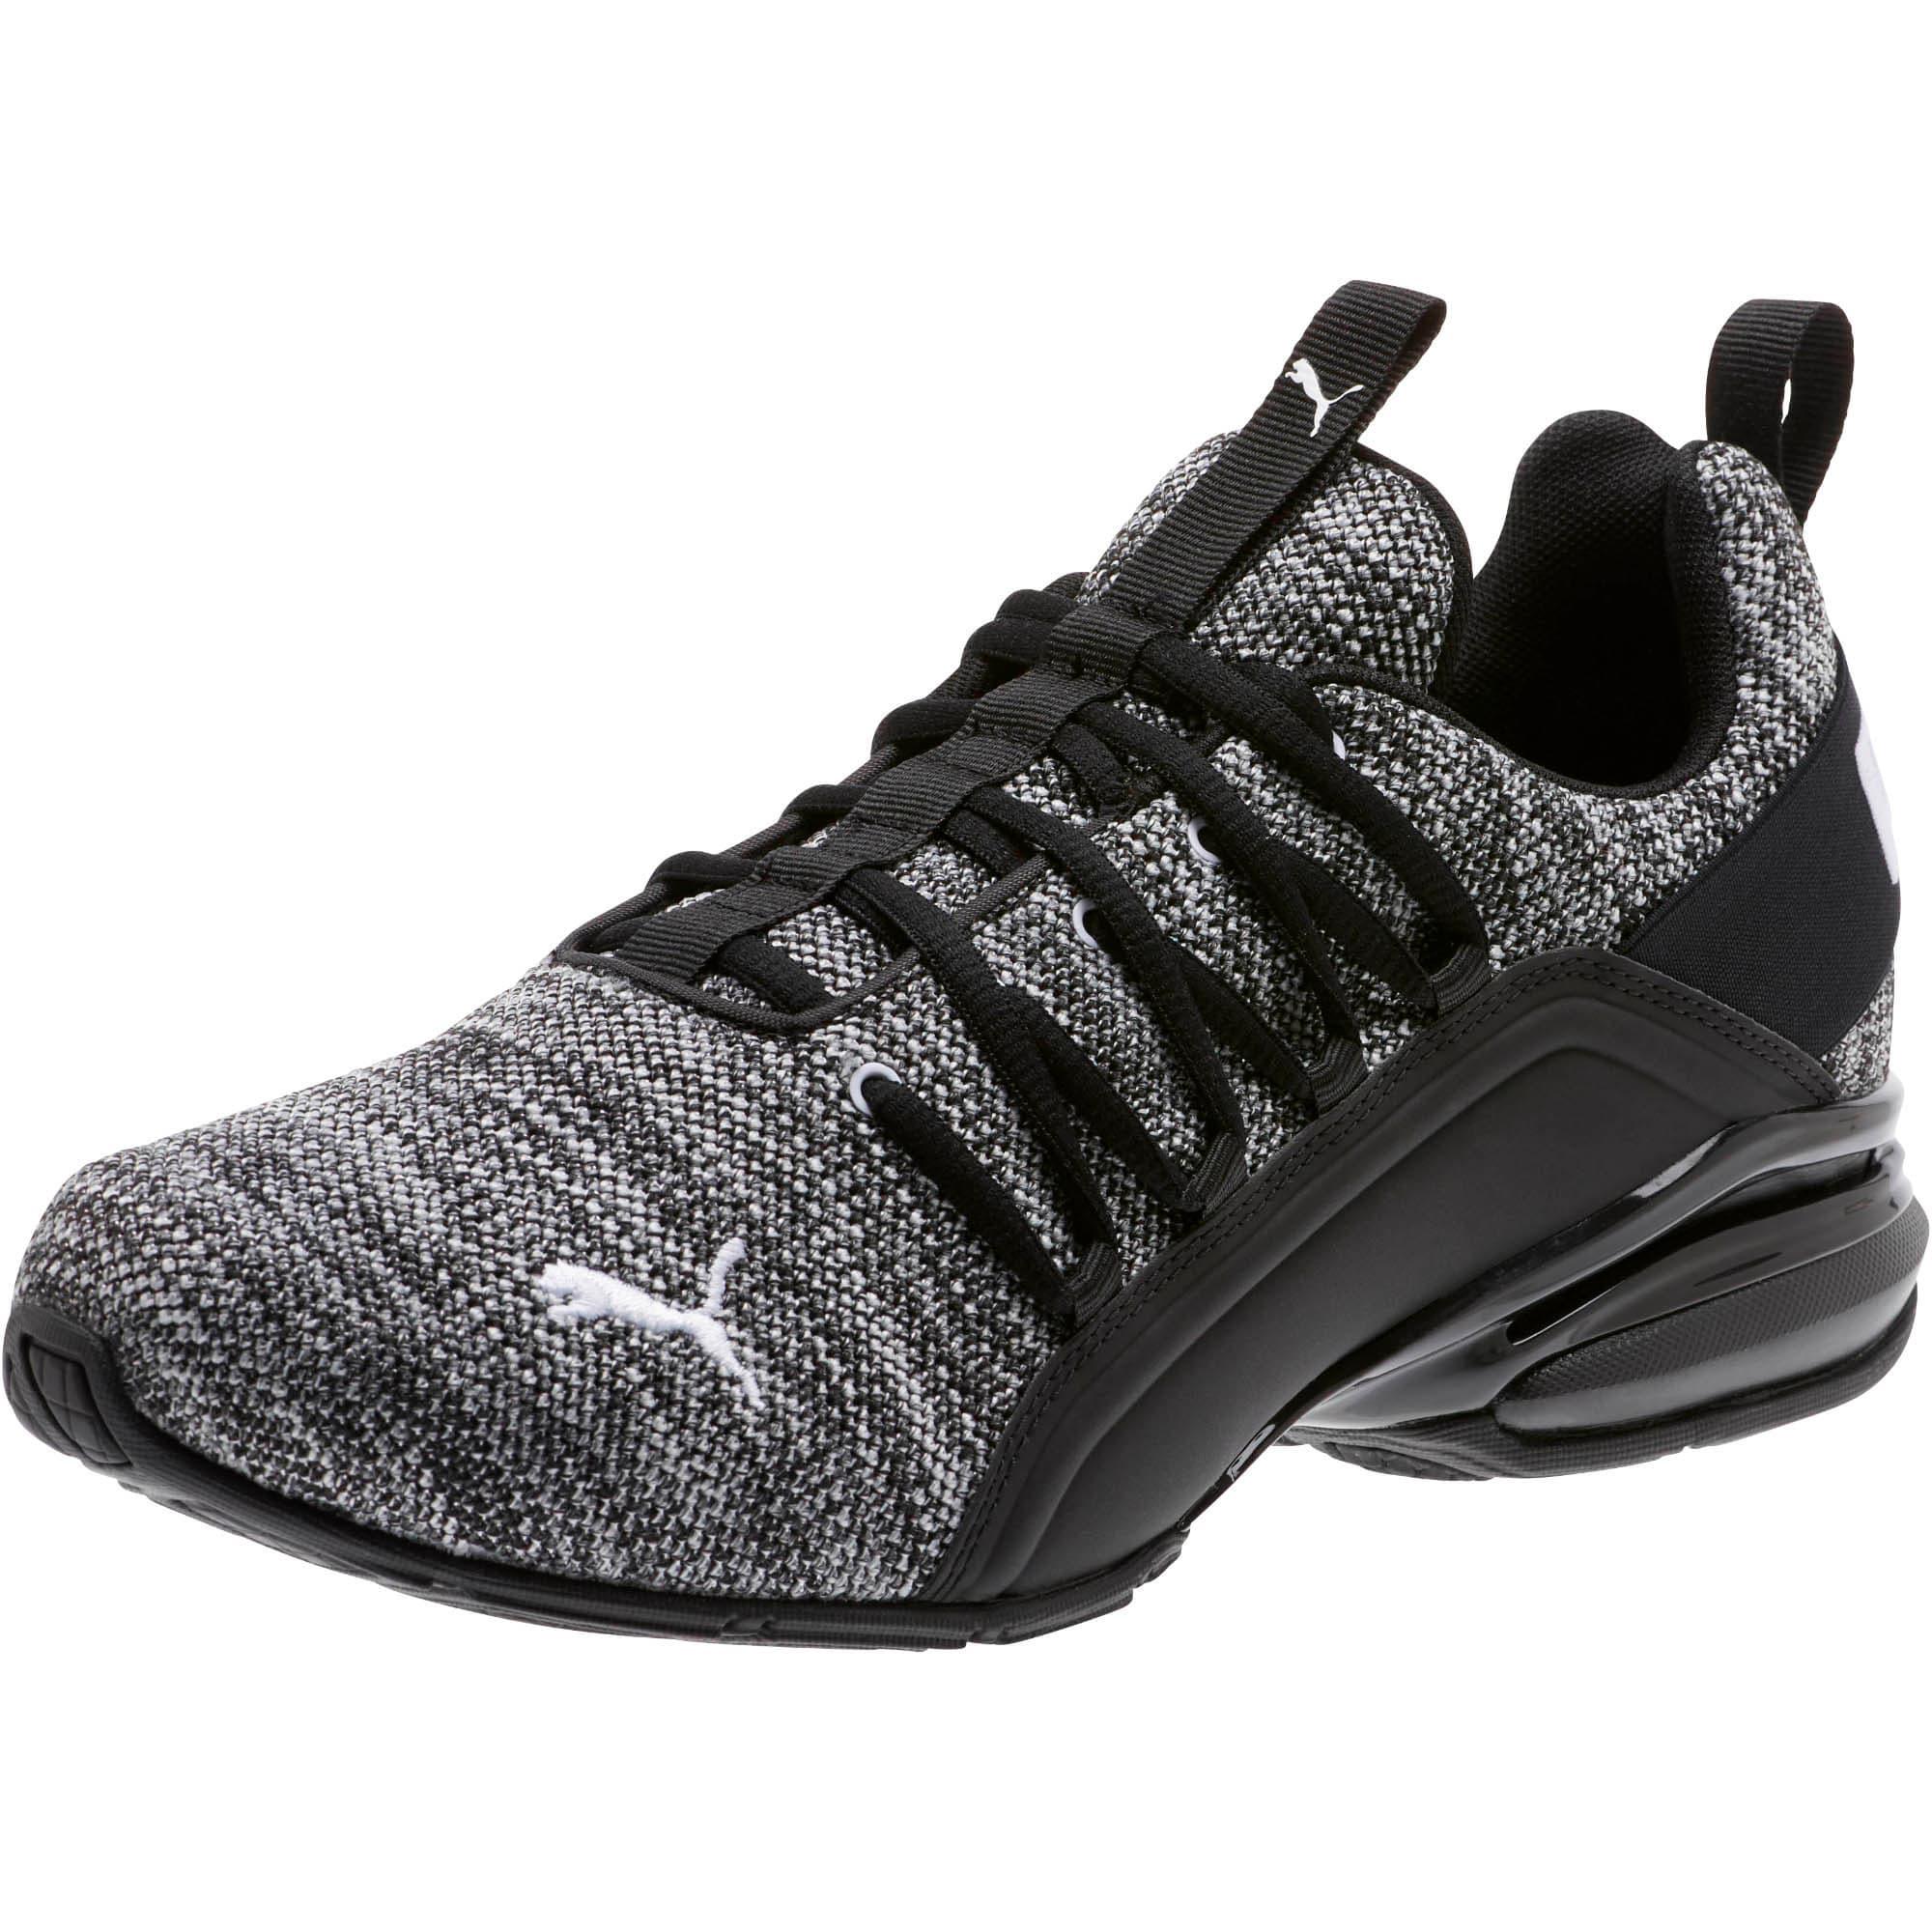 Thumbnail 1 of Axelion Wide Men's Training Shoes, Puma Black-Puma White, medium